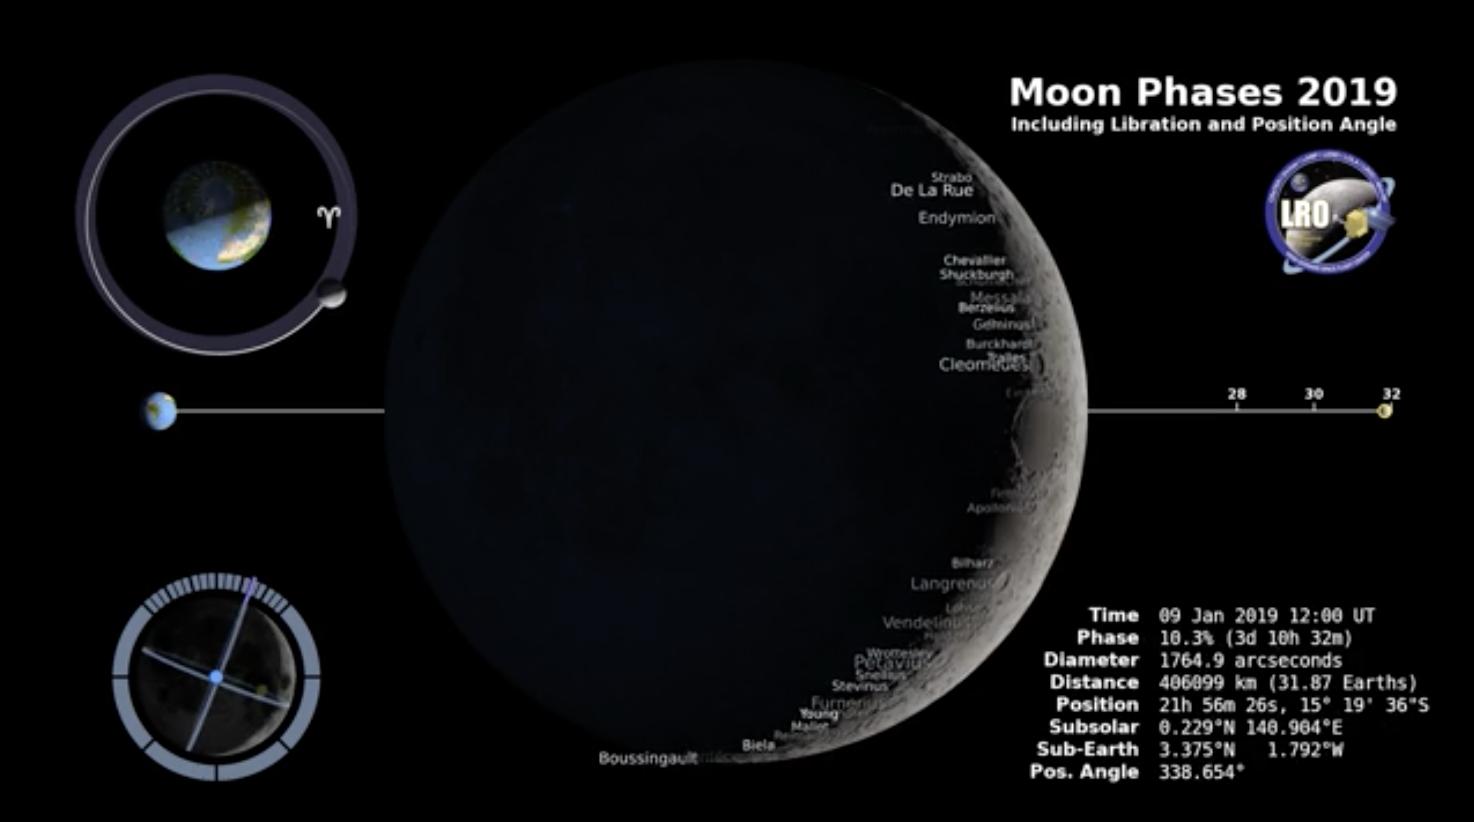 Moon Phase and Libration, 2019 | NASA Solar System Exploration